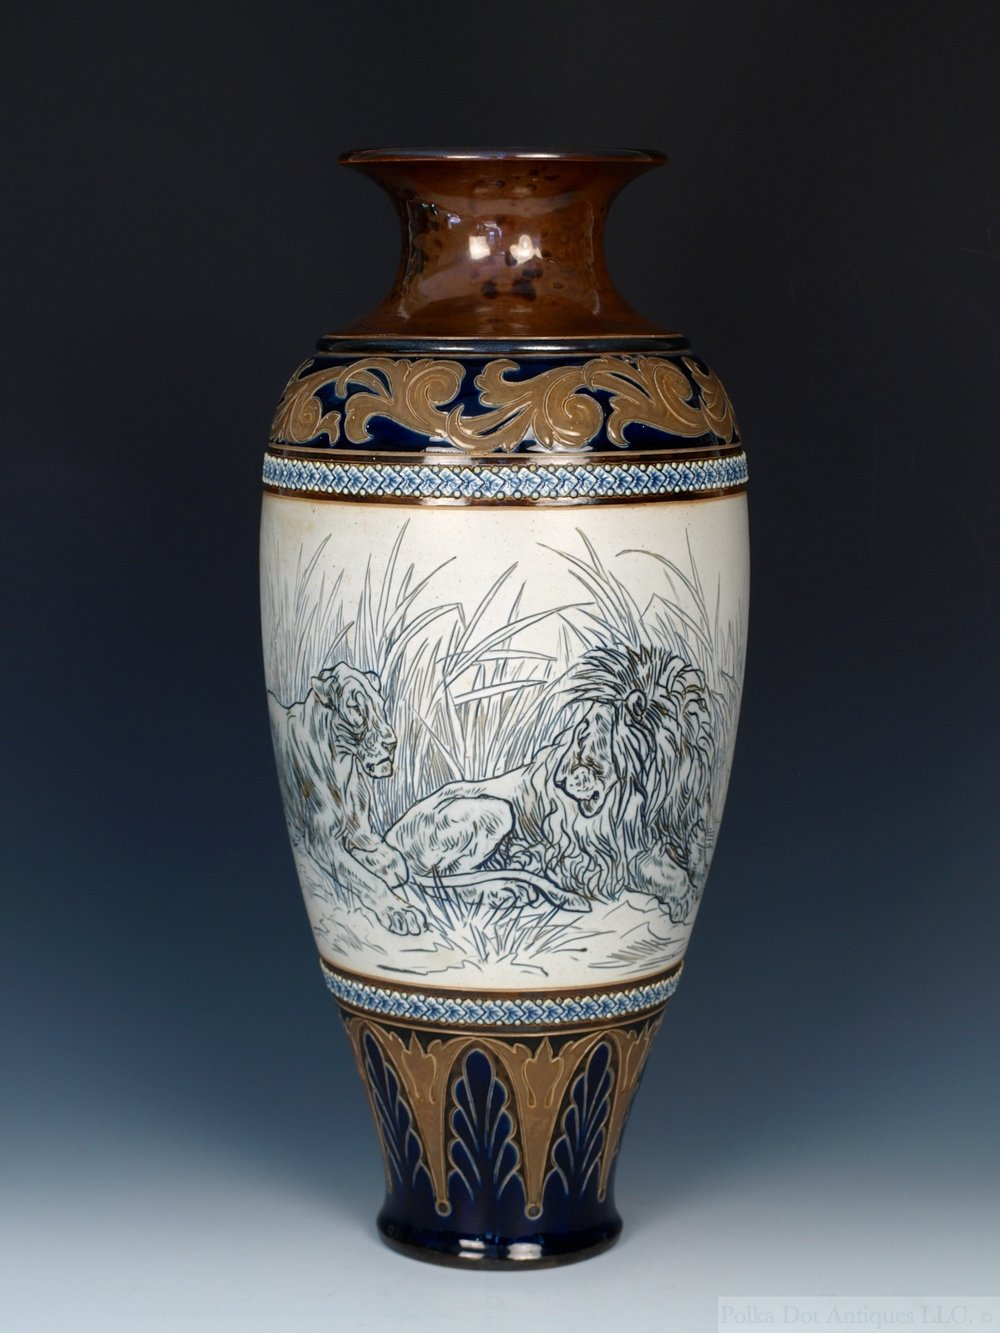 rpw349 Doulton Hannah Barlow Lions Vase - 02.jpg